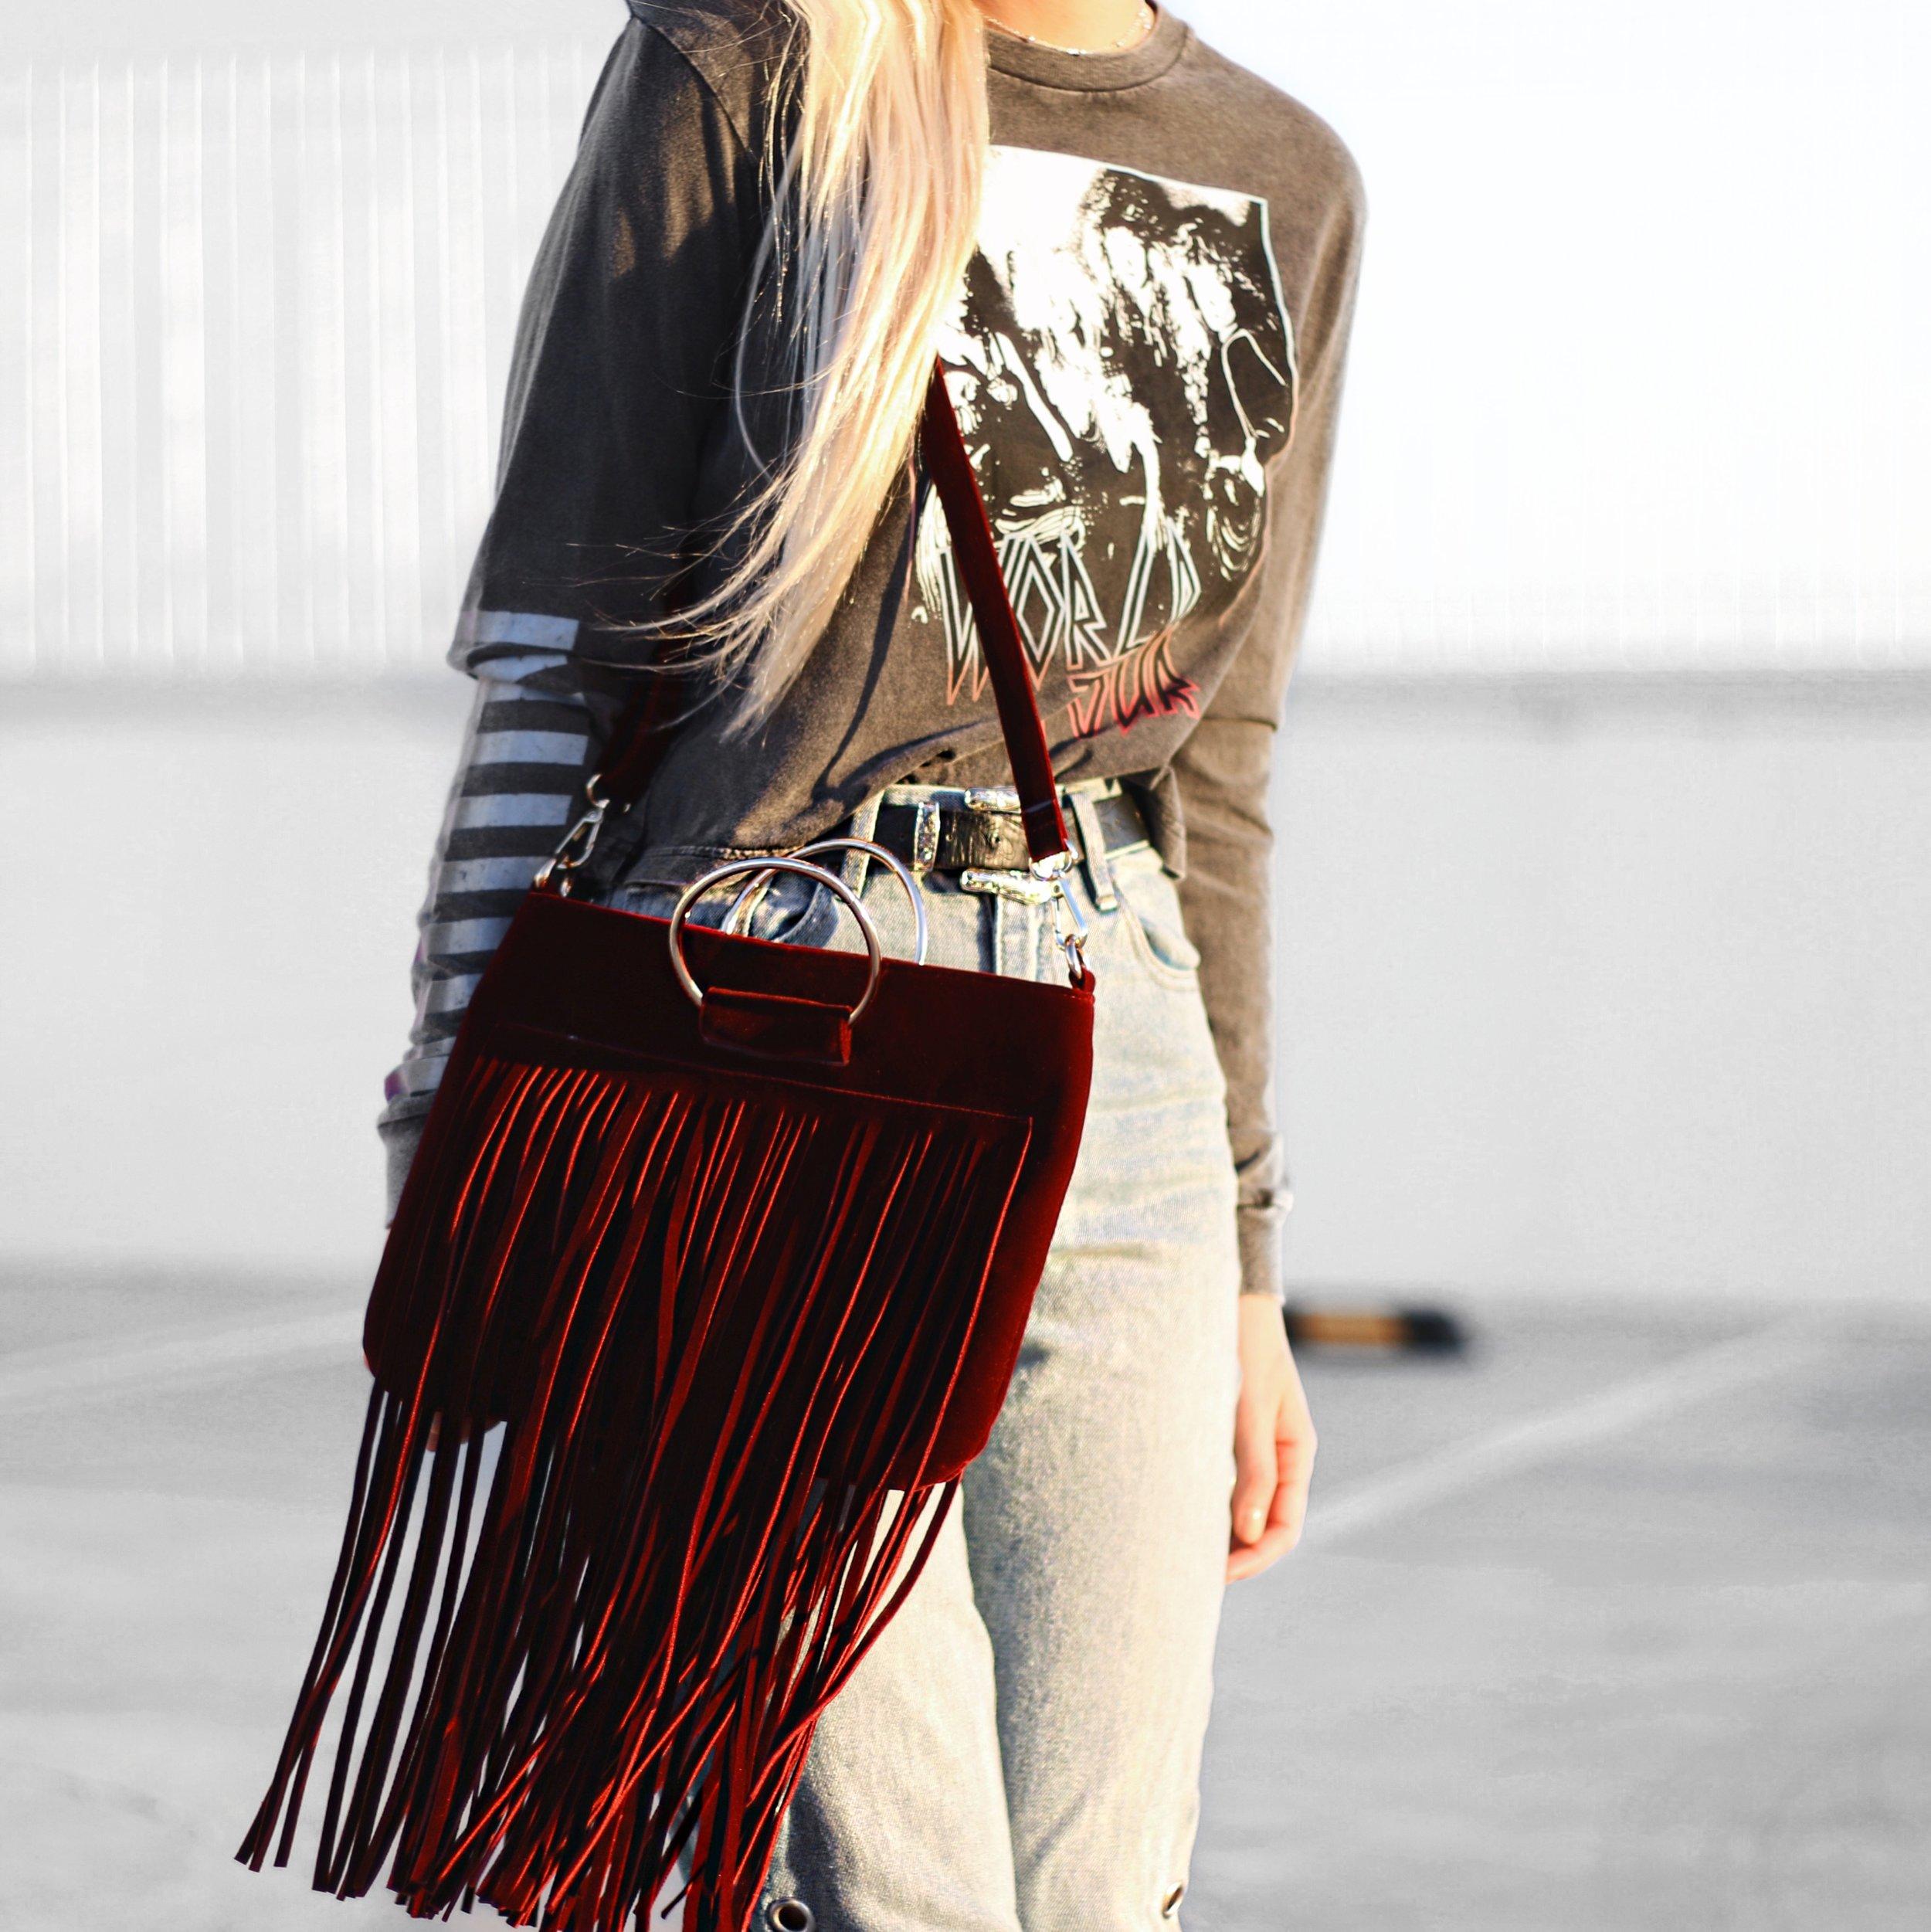 Etelet Jeans and Colette Bag